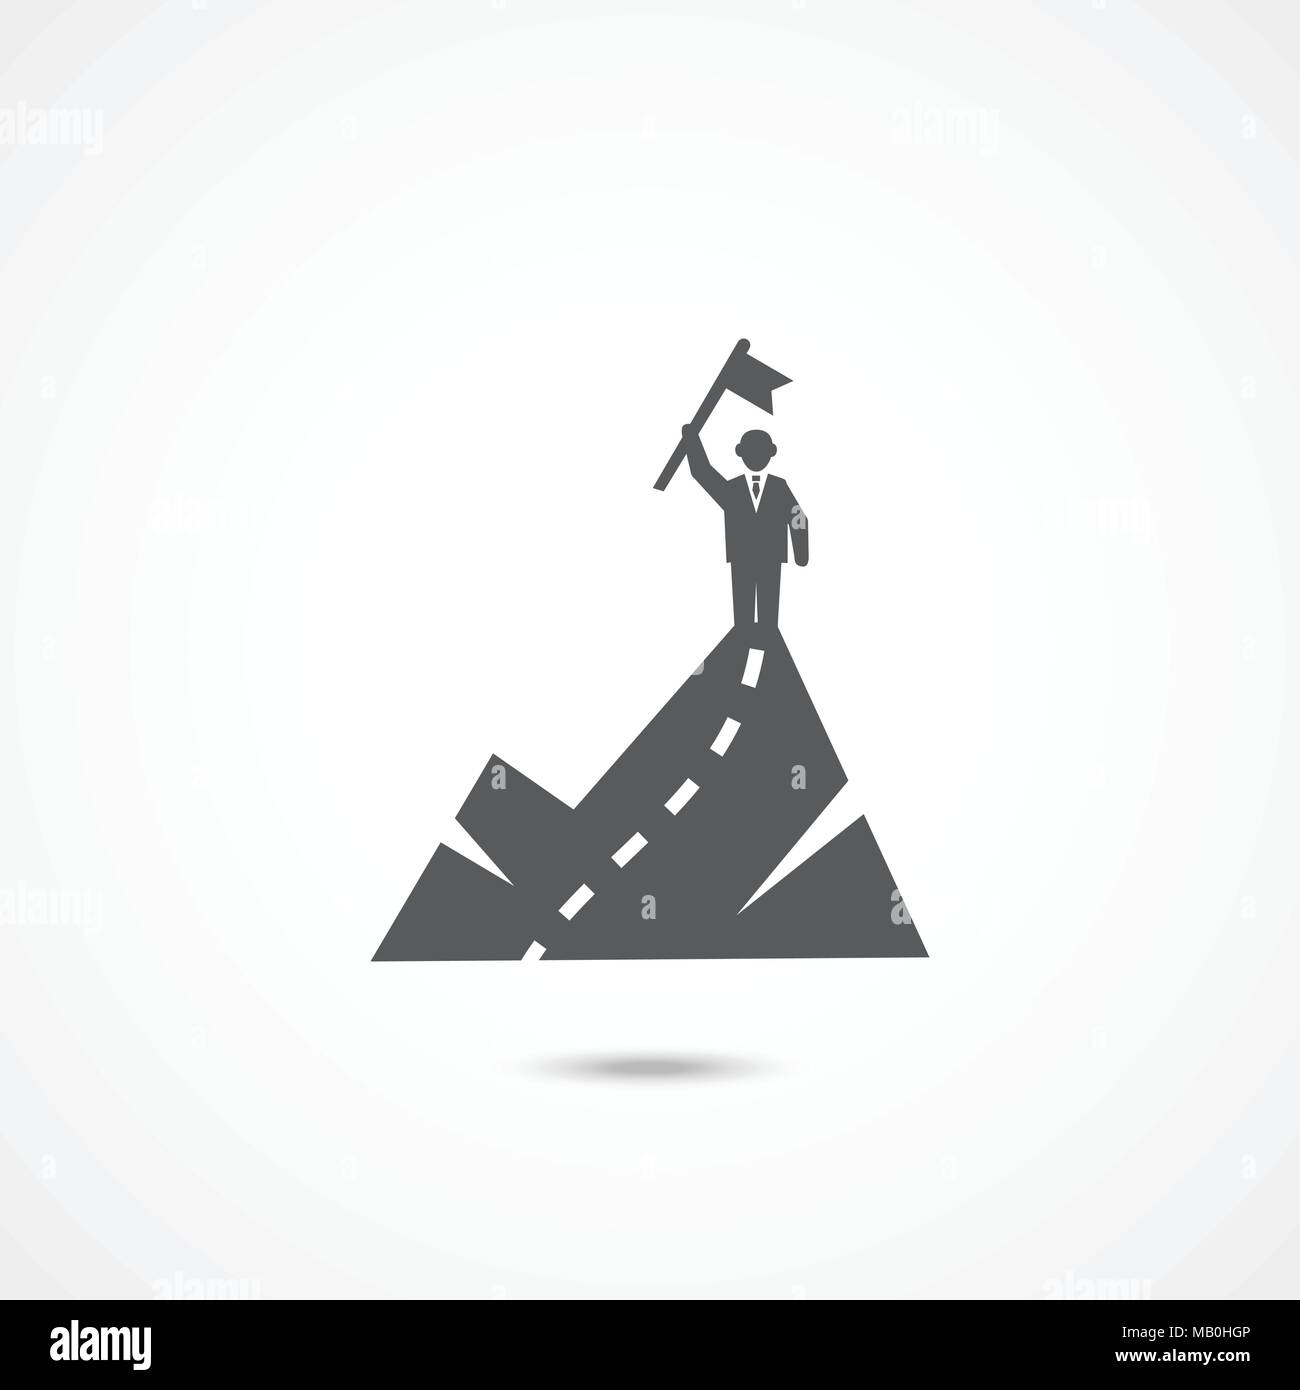 Icono de éxito sobre blanco Imagen De Stock